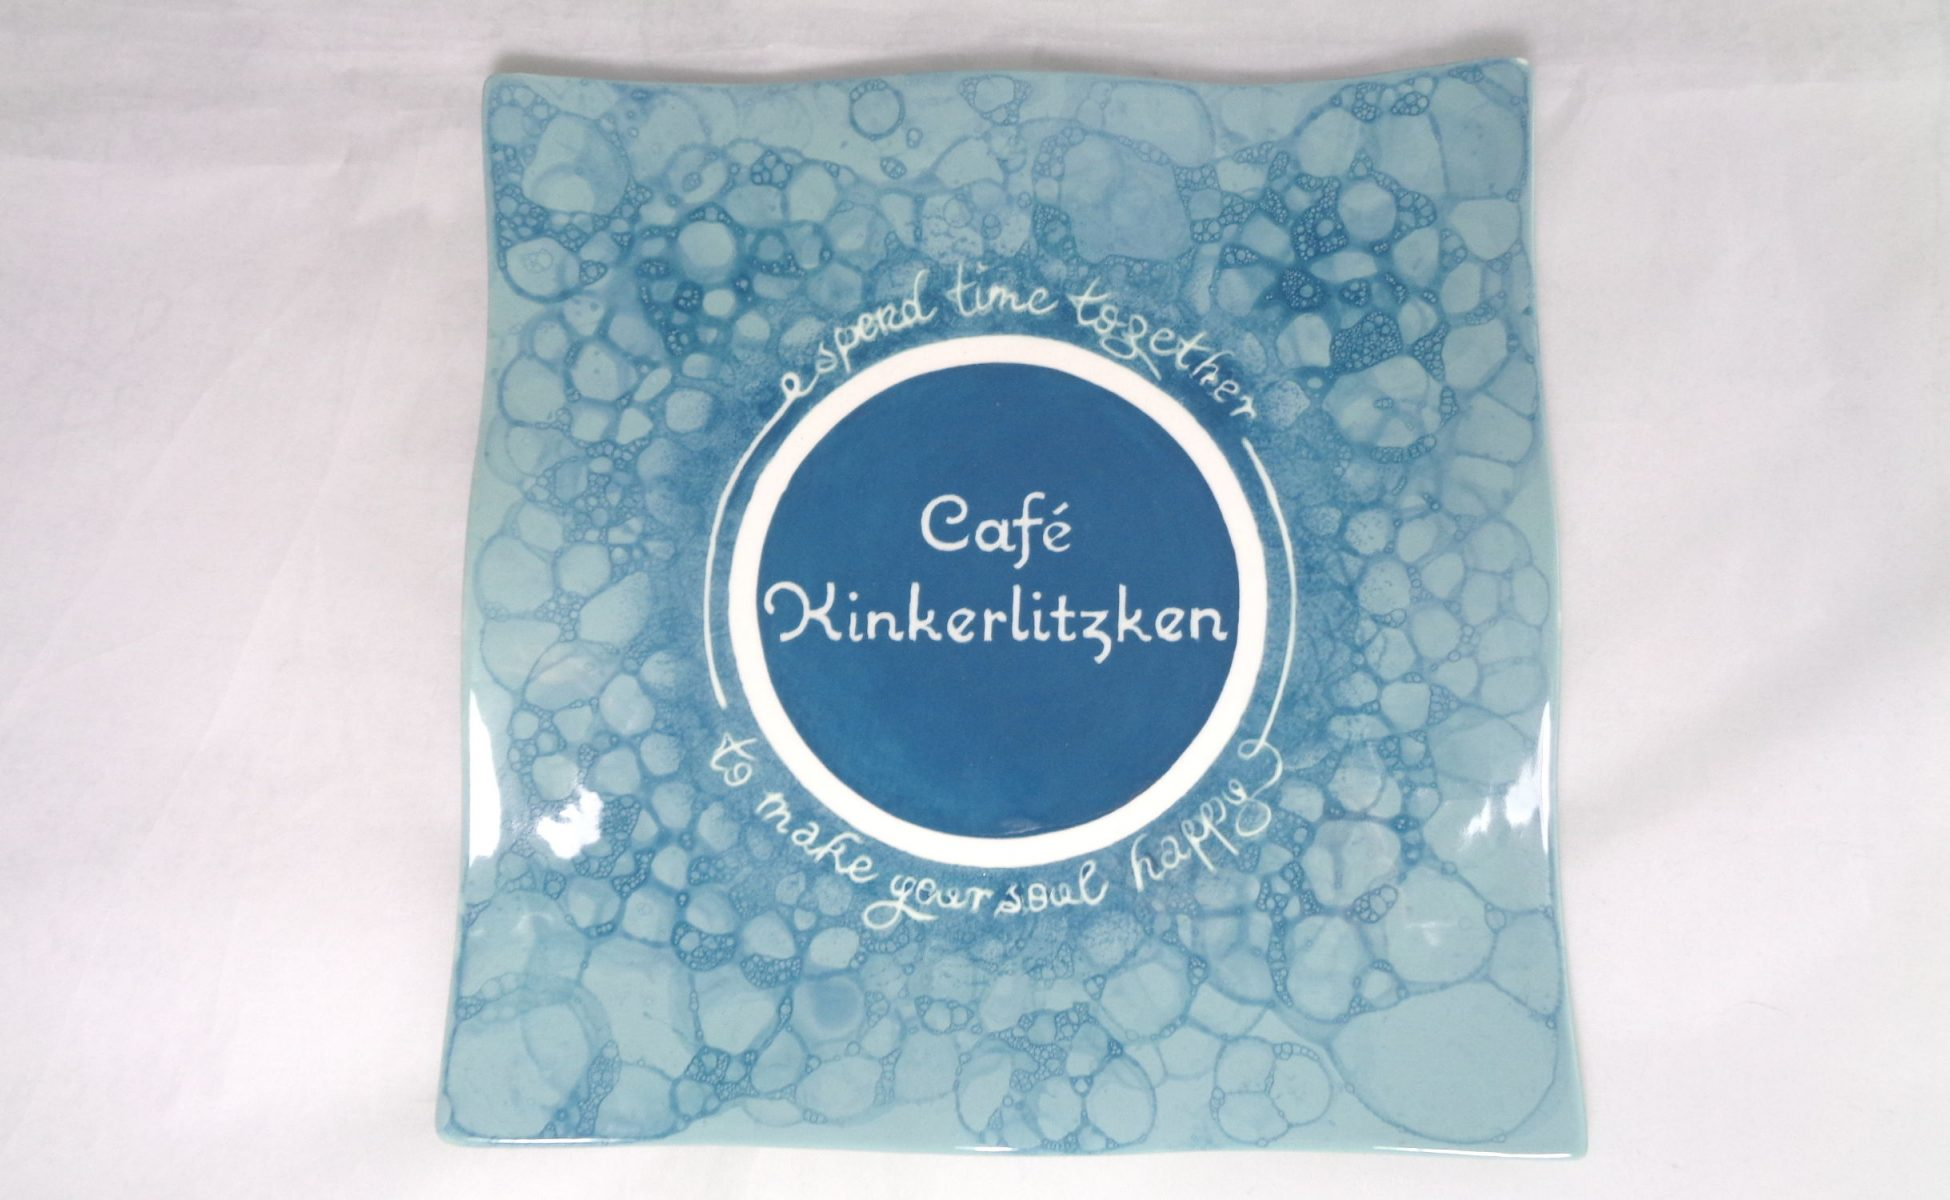 Bemalte Keramik Cafe-Kinkerlitzken-Wellenteller Blubber